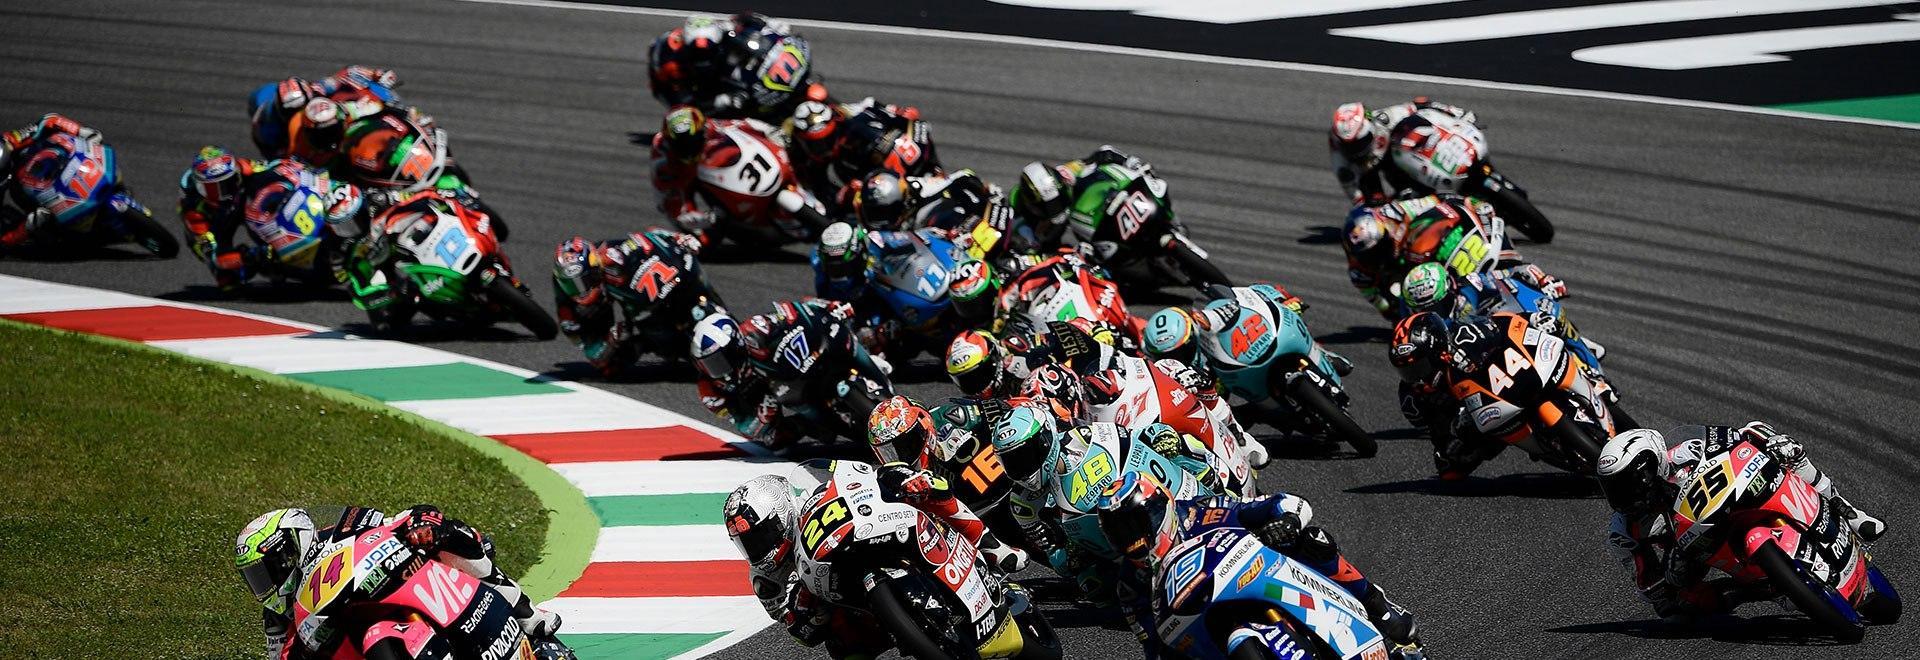 Superbike Mugello. Race 2